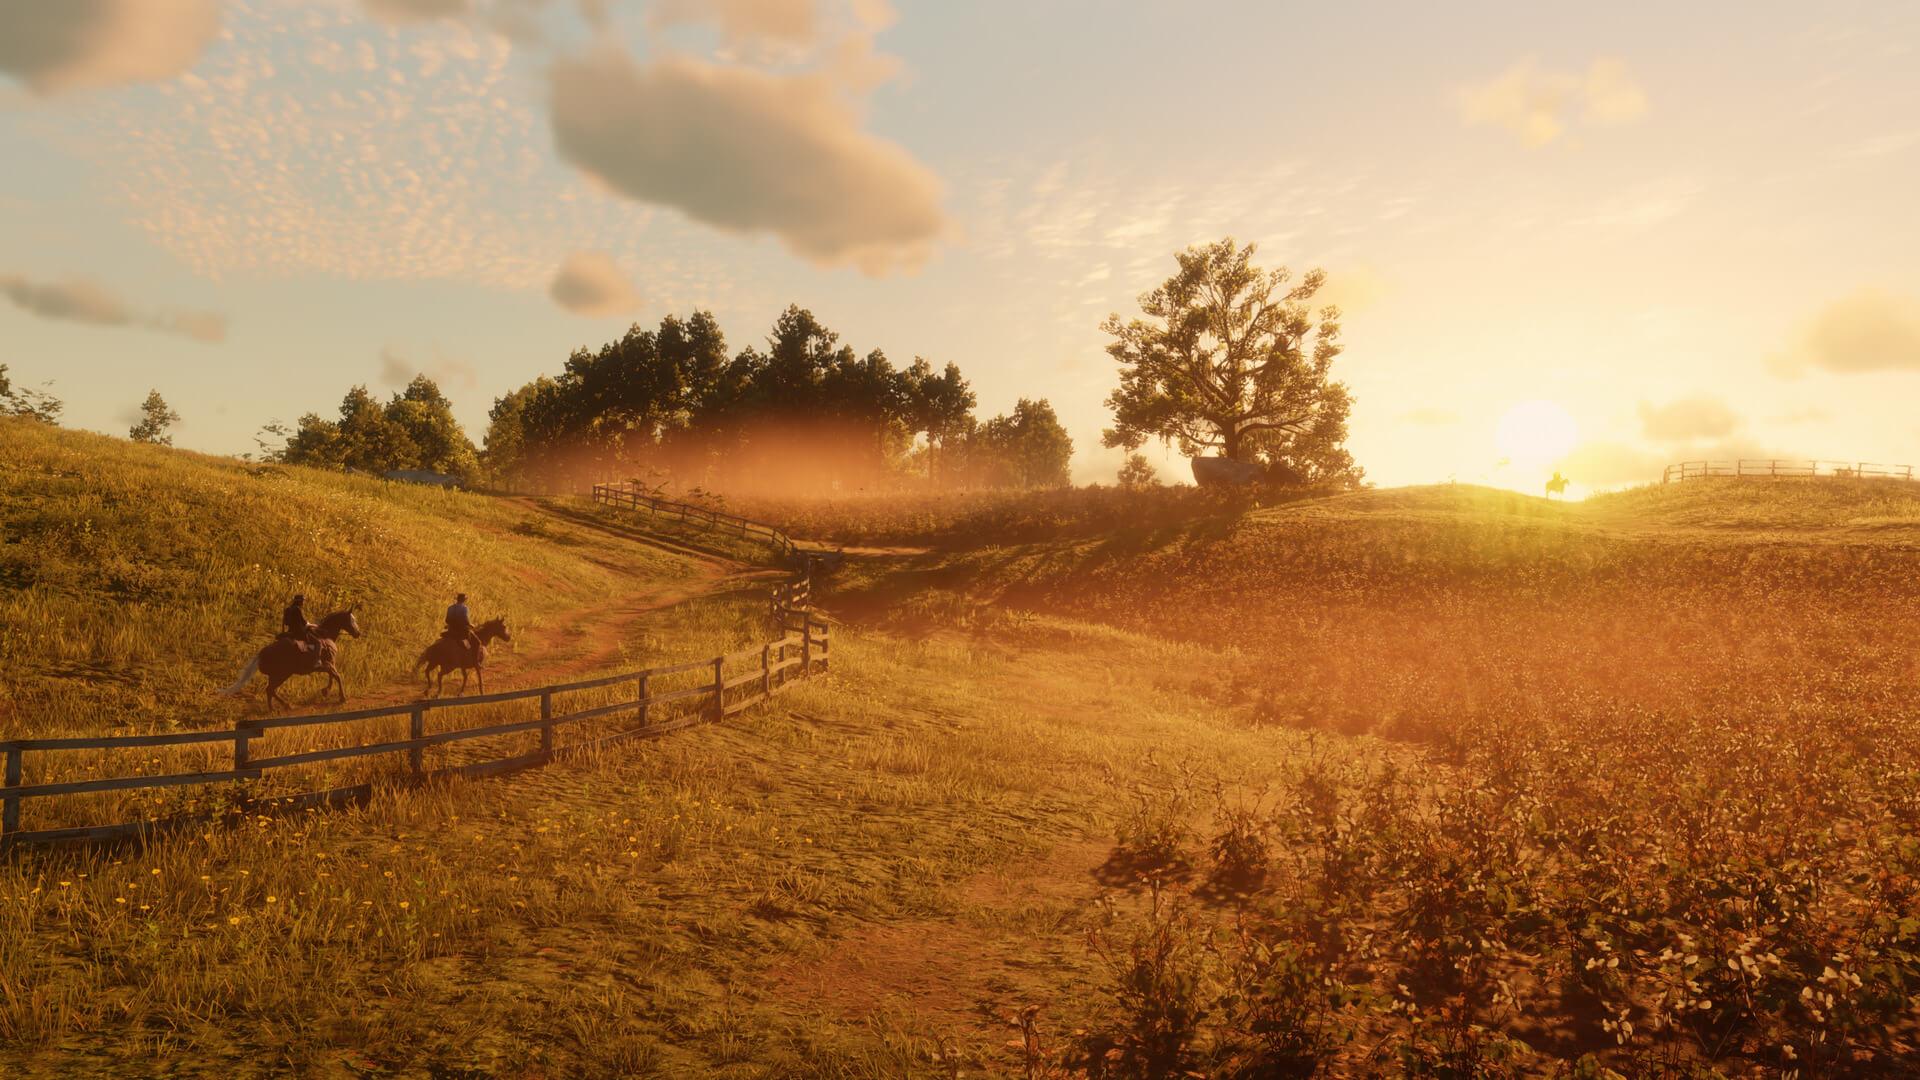 Red Dead Redemption 2 İncelemesi | Red Dead Redemption 2 Gün Batımı